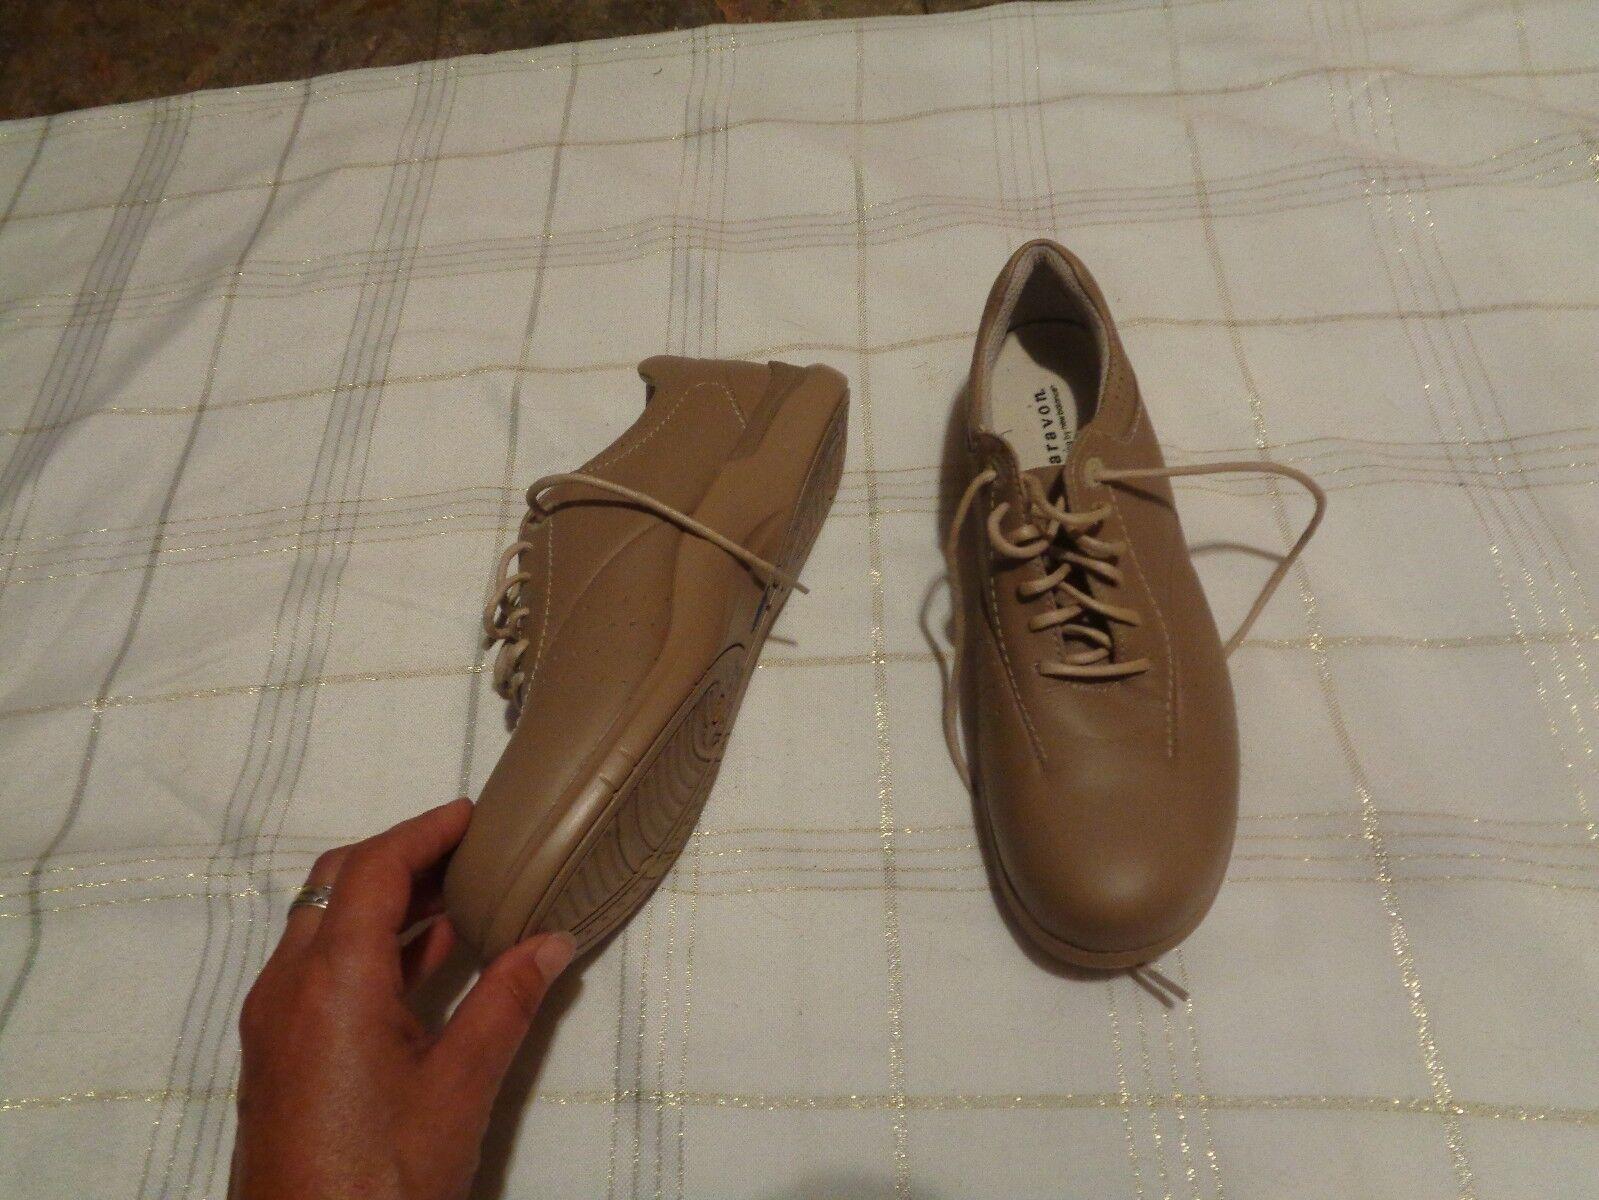 Aravon wef075d dark tan leather lace up scarpe scarpe scarpe Dimensione 9 2A f98910